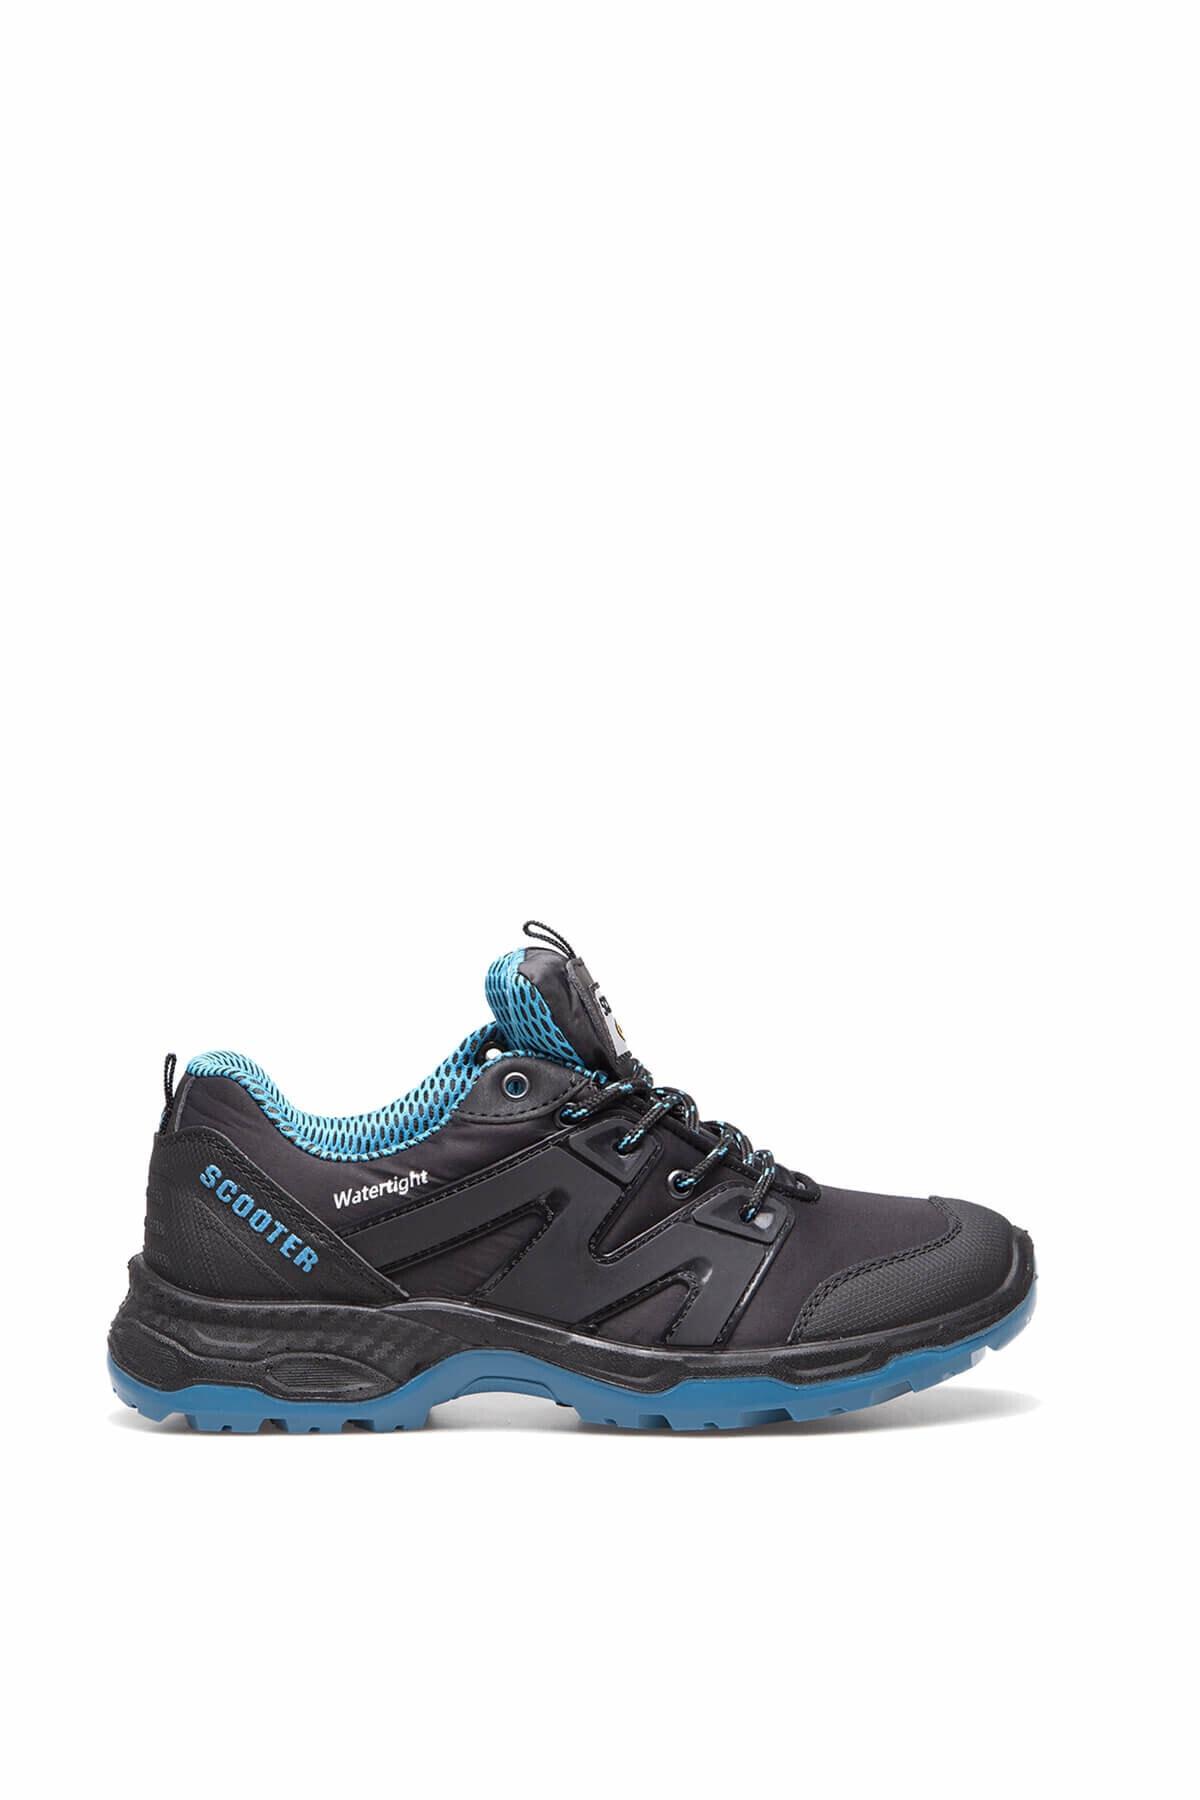 Scooter Su Geçirmez Kadın Siyah-Mavi Sneaker - 3W92G5222T 2